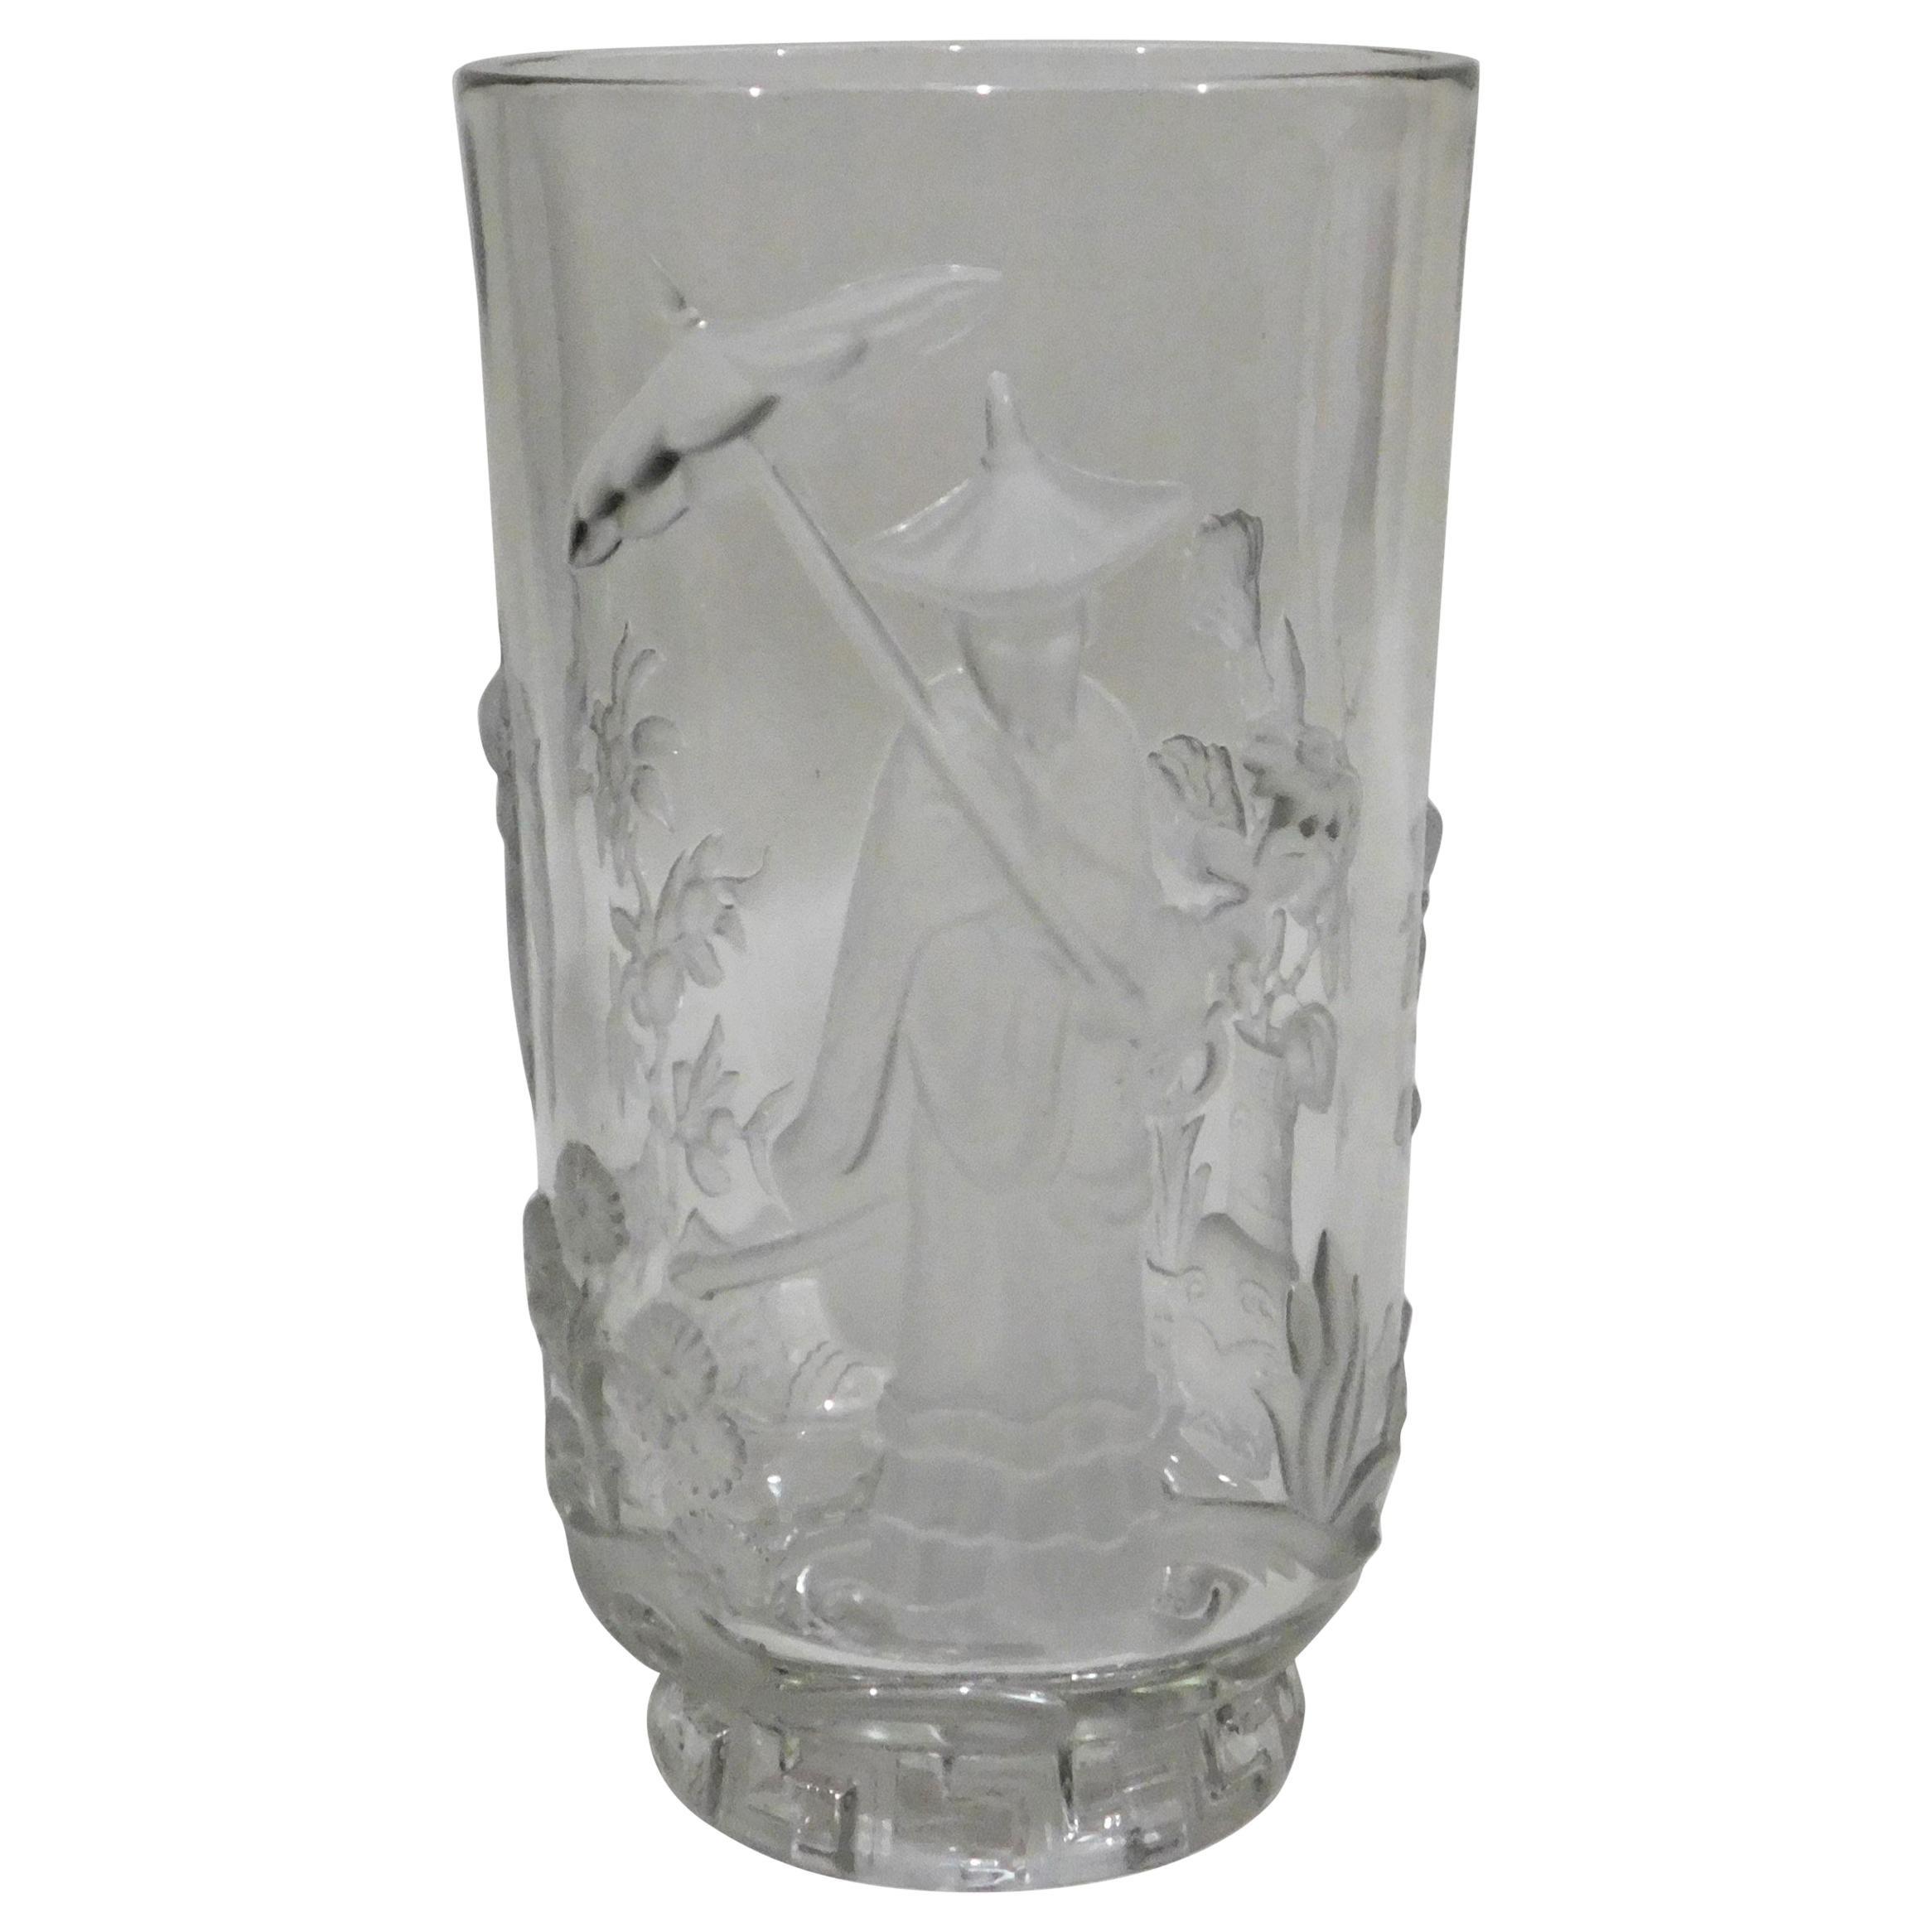 American Crystal Art Glass Verlys Vase with Chinese Mandarin Design